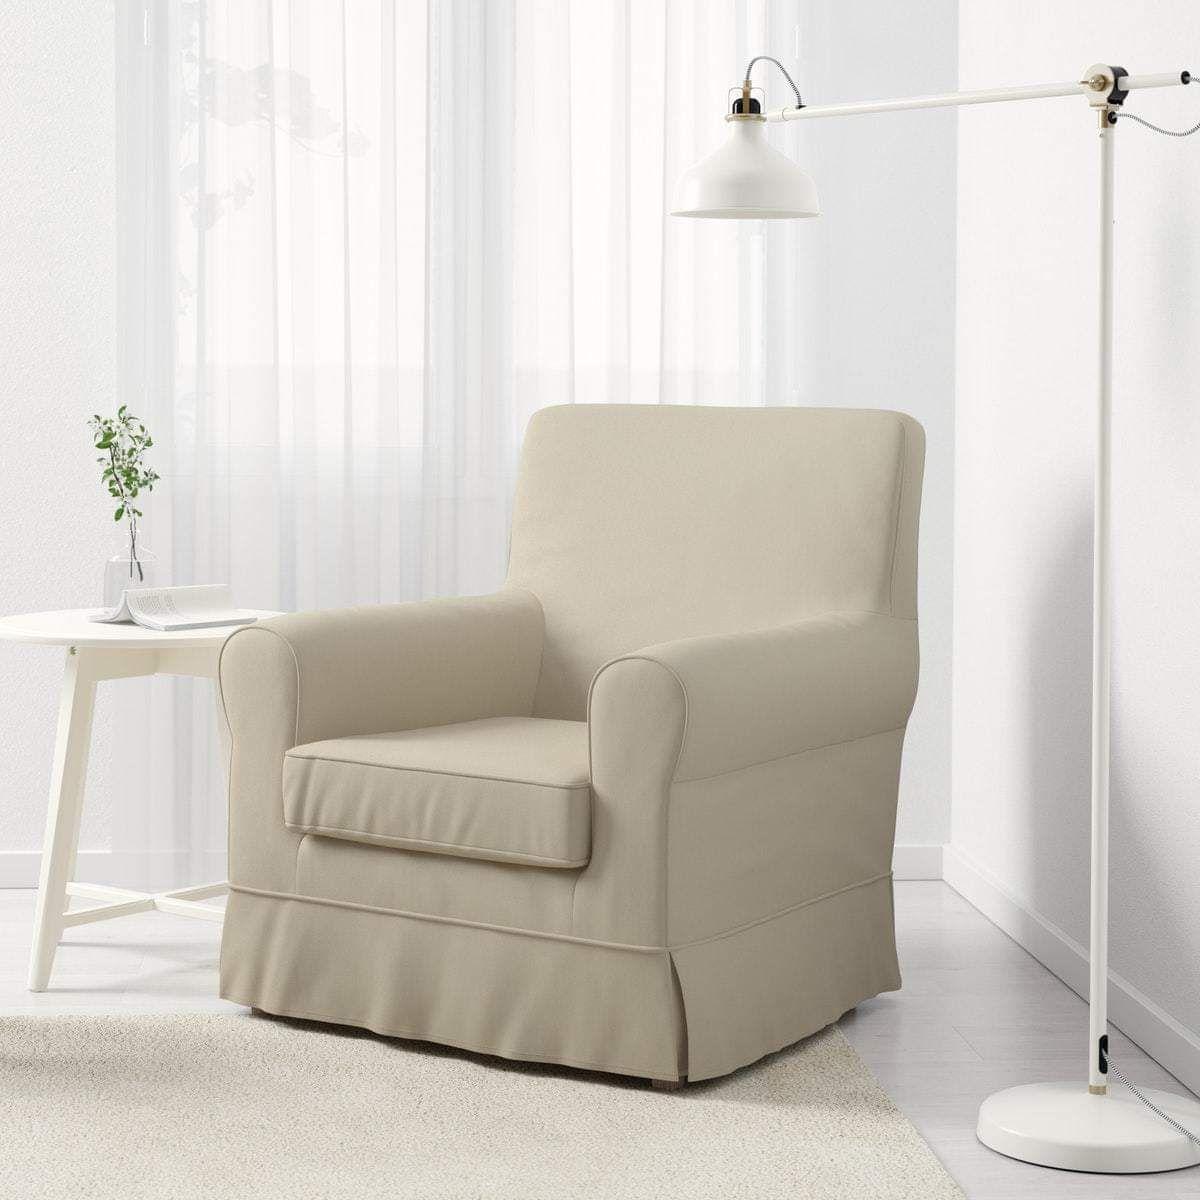 fauteuil ikea jennylund housse tigelsjo beige. Black Bedroom Furniture Sets. Home Design Ideas